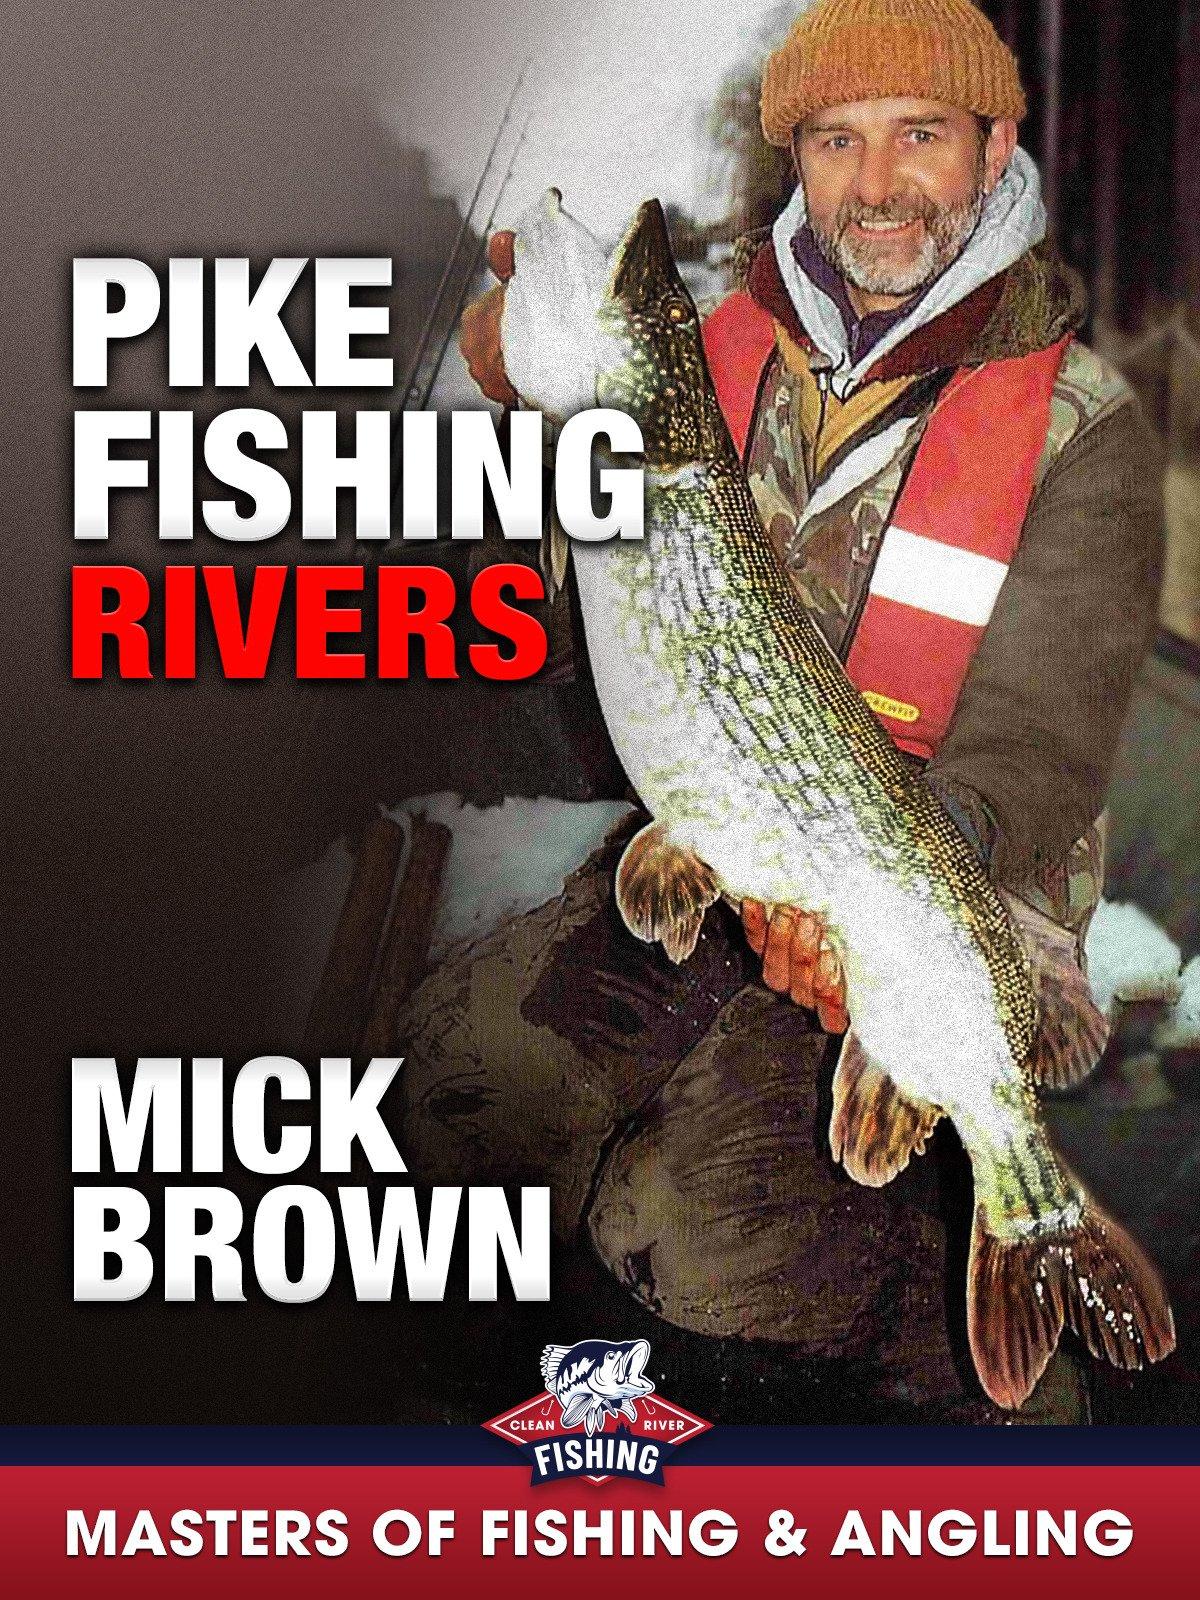 Pike Fishing: Rivers on Amazon Prime Video UK